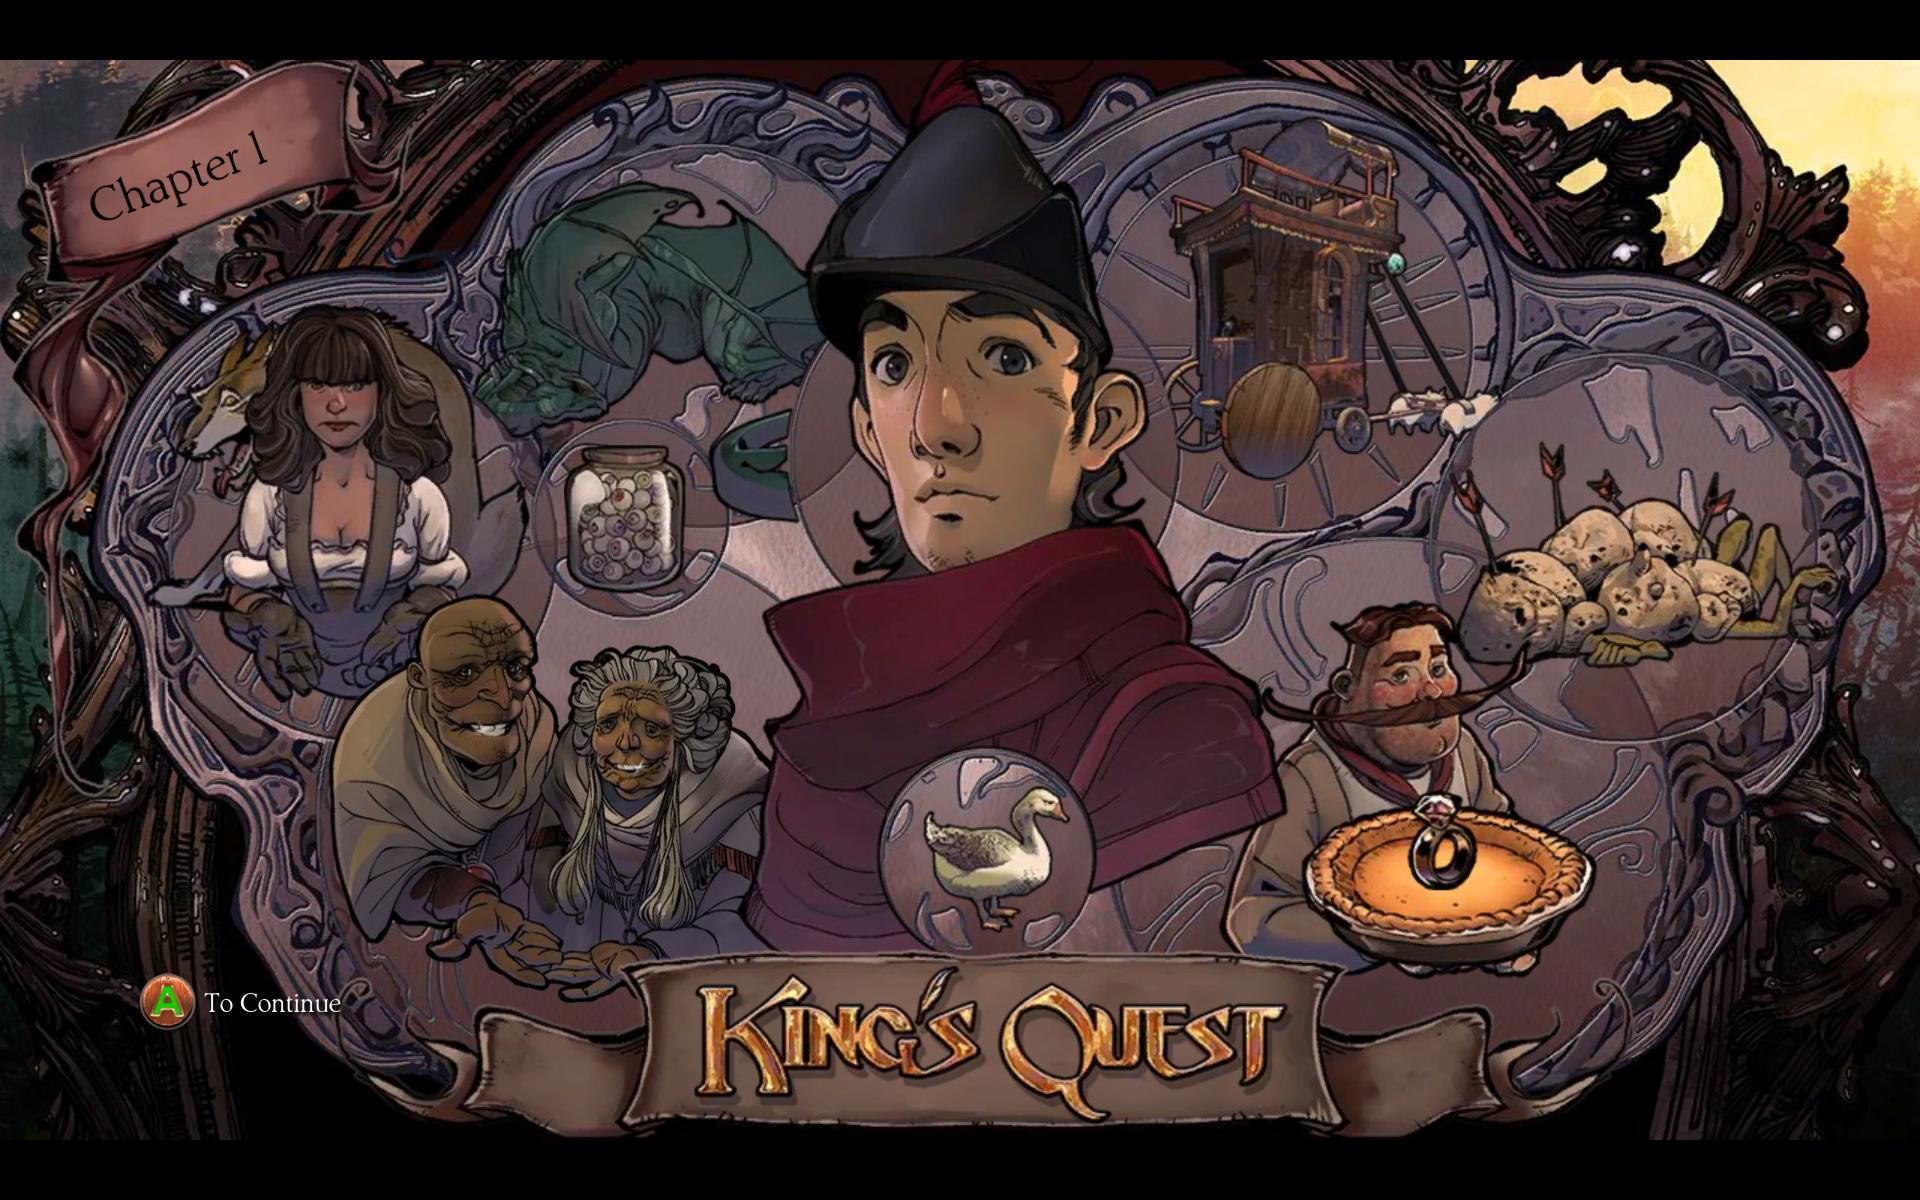 KingsQuest-2015-08-04-16-43-02-75